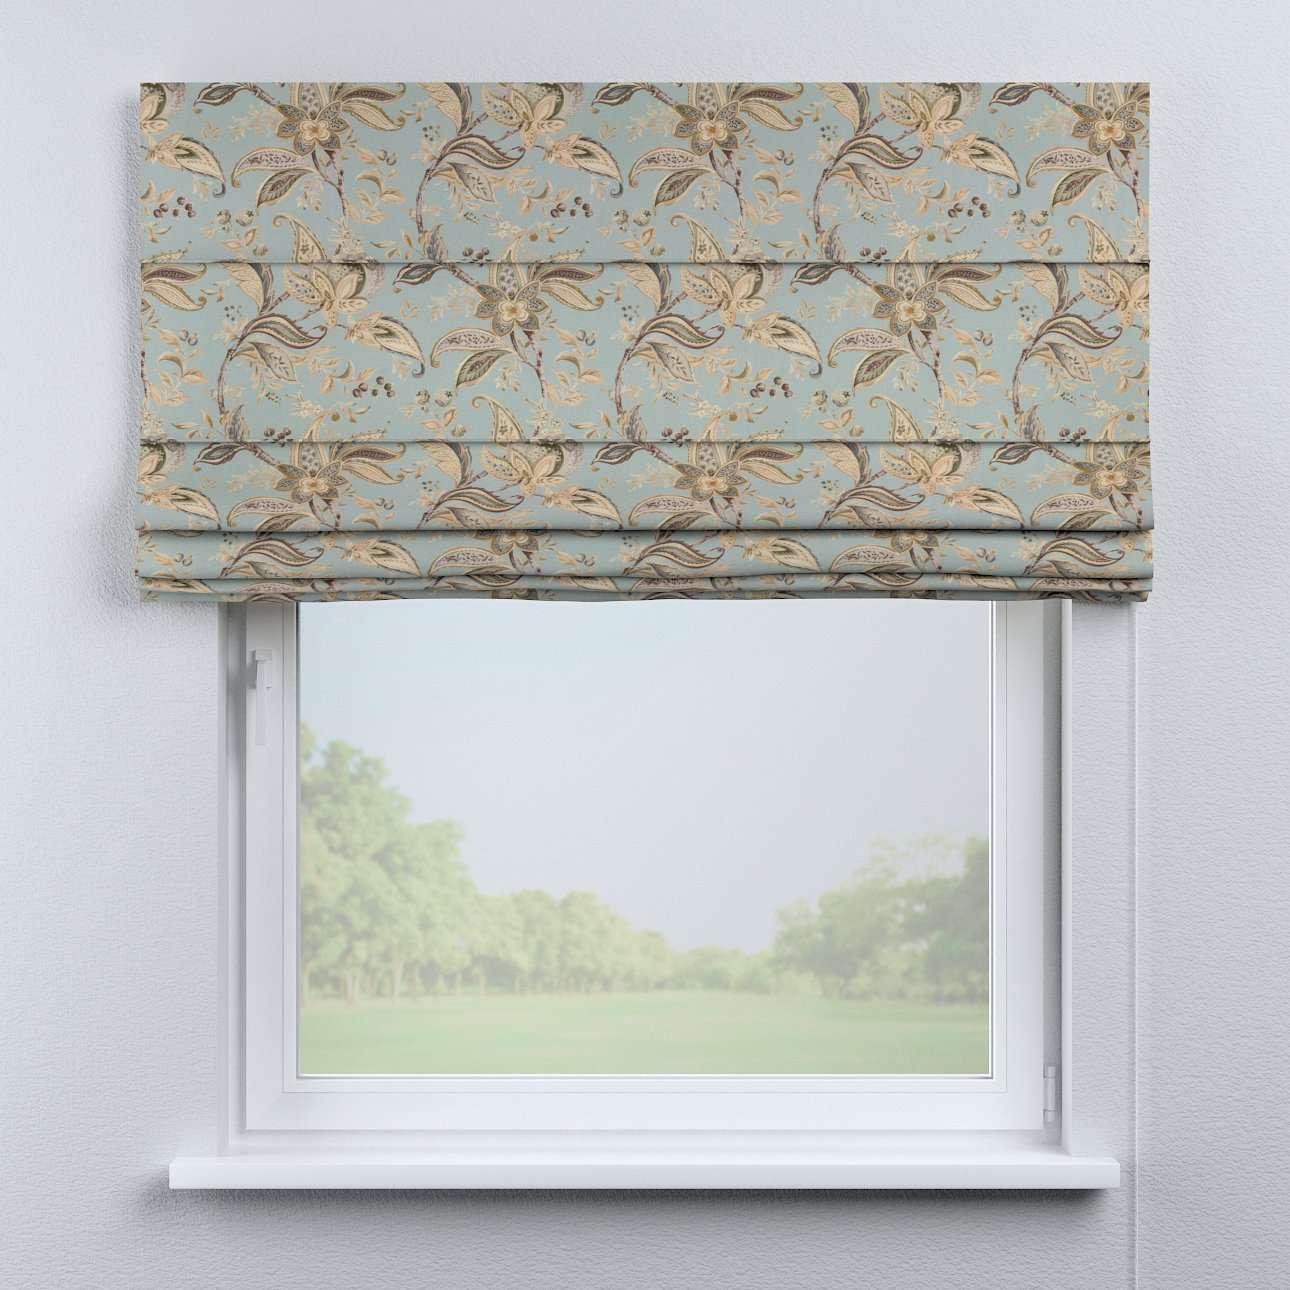 Rímska roleta Capri V kolekcii Gardenia, tkanina: 142-18